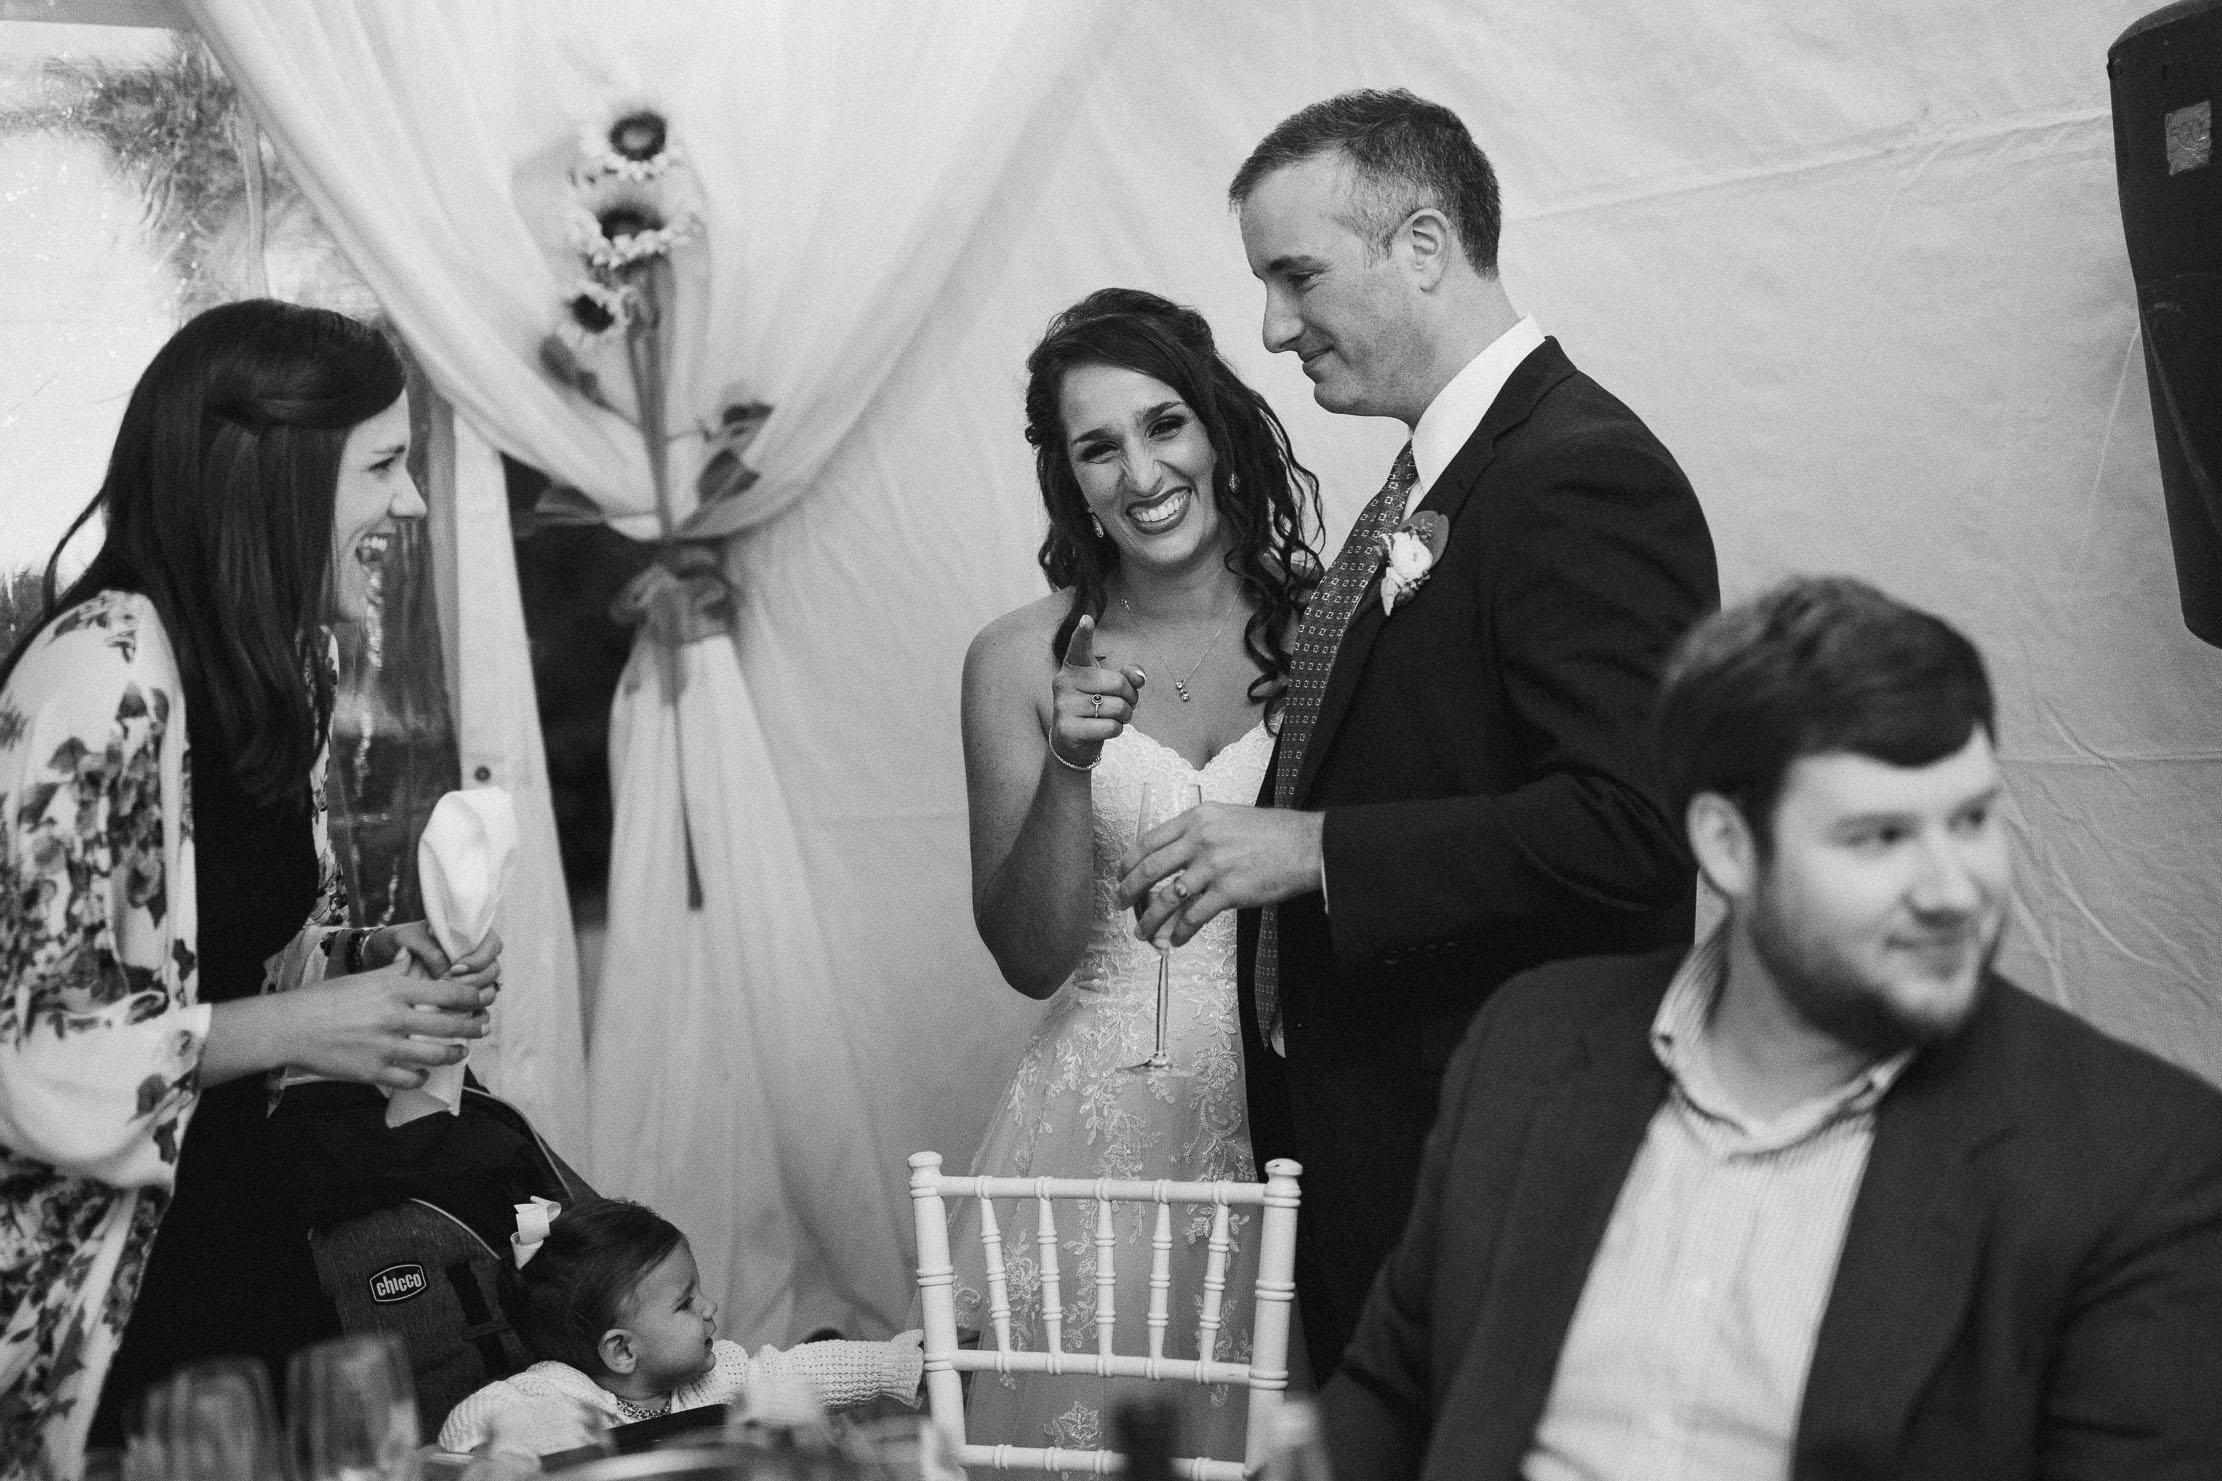 Wings-Castle-Millbrook-NY-Upstate-Wedding-Photographer-1127.jpg